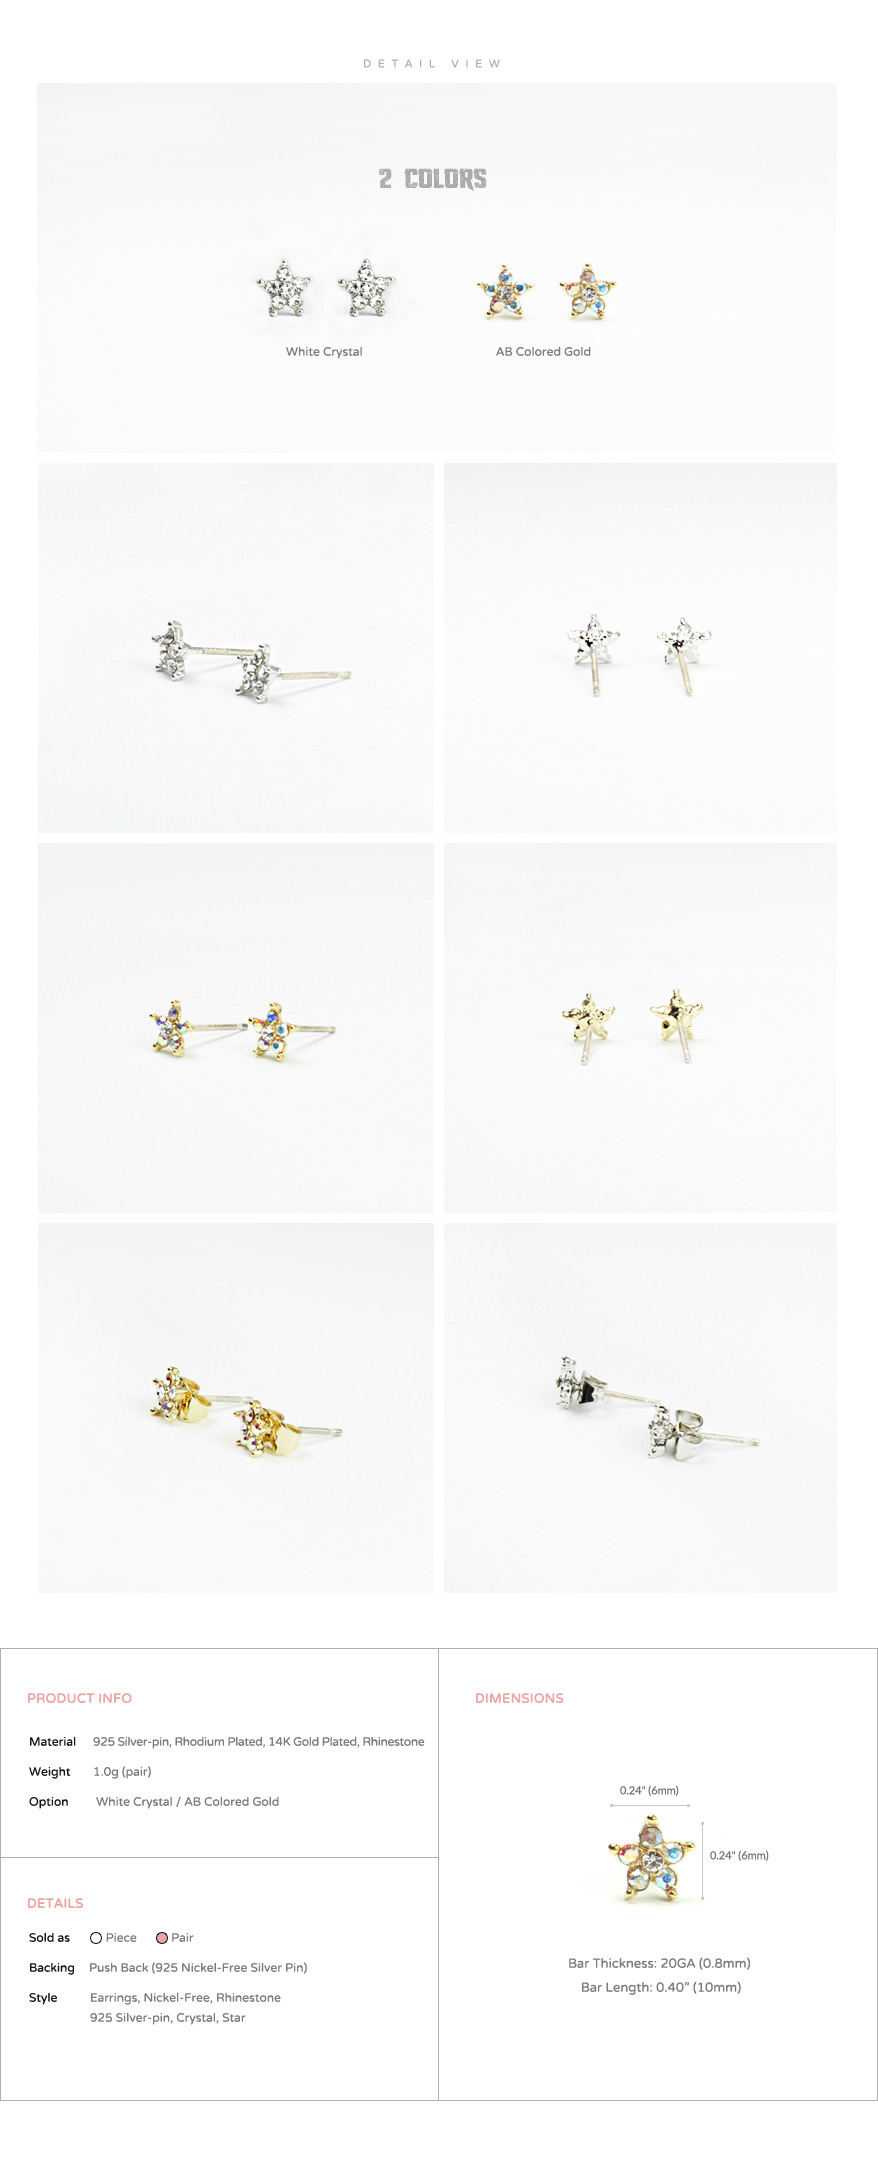 accessories_ear_stud_earrings_korean_asian-style_Crystal_Rhinestone_925-silver_Rhodium-Plated_14K-Gold-Plated_Nickel-Free_Star_2